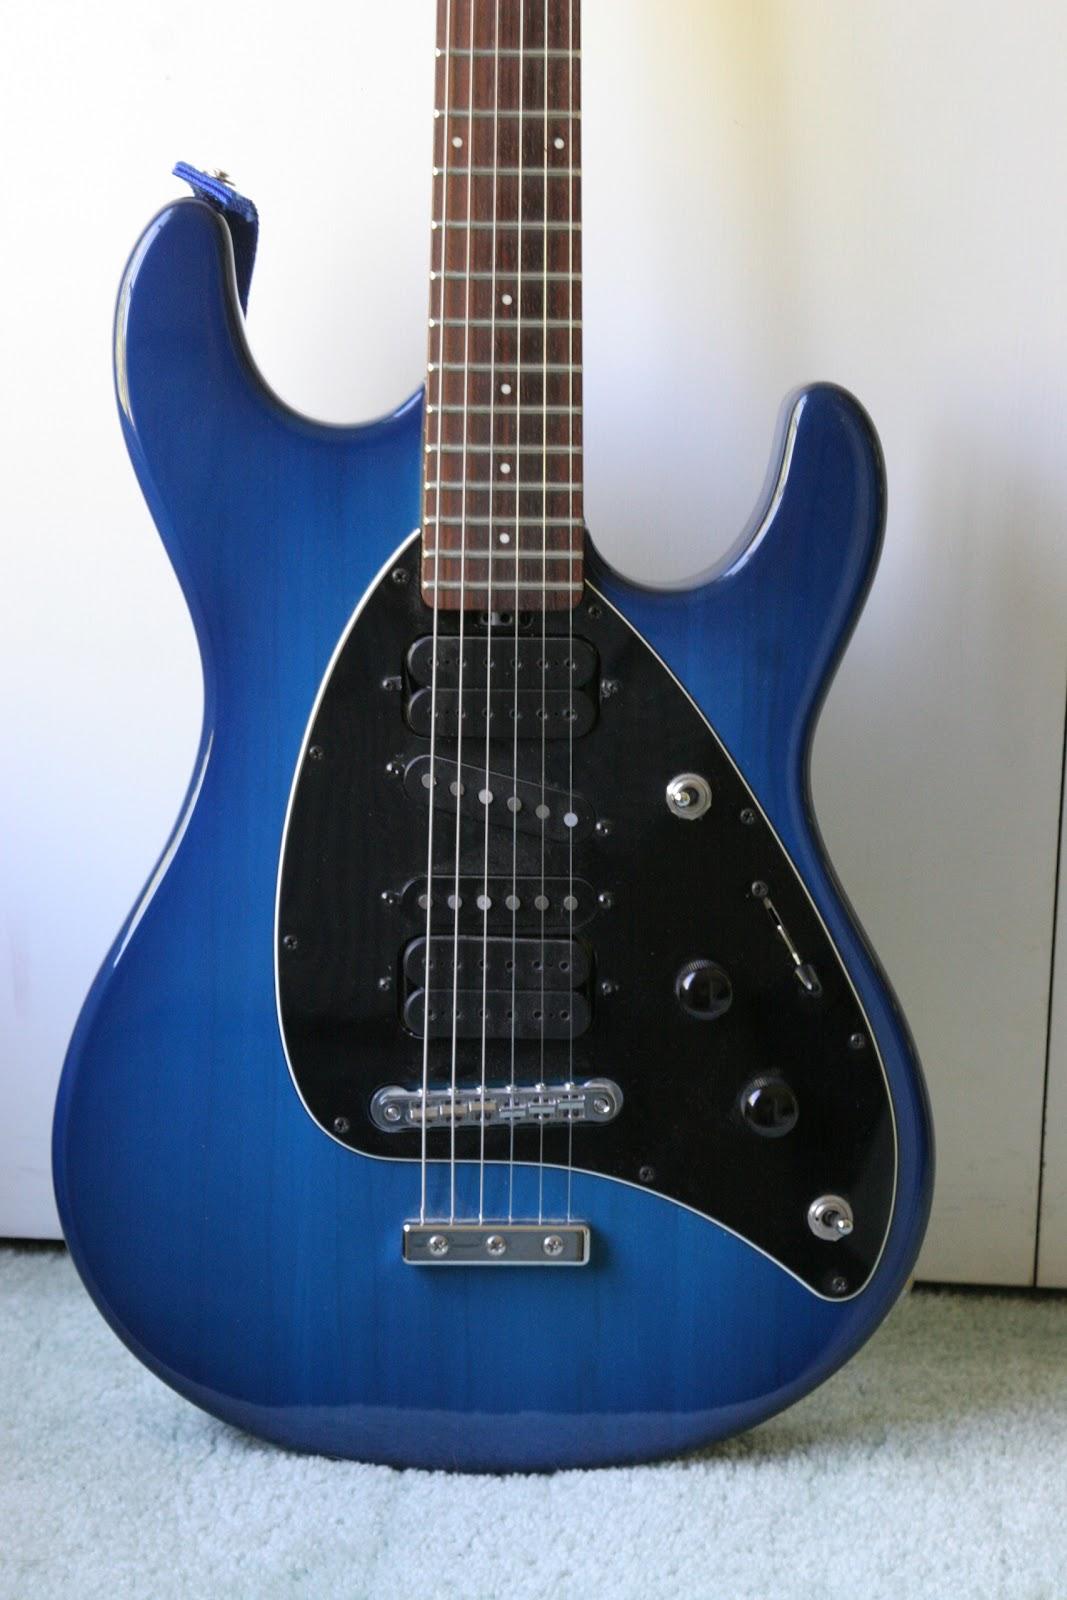 guitar industry trends and dynamics steve morse musicman guitar. Black Bedroom Furniture Sets. Home Design Ideas